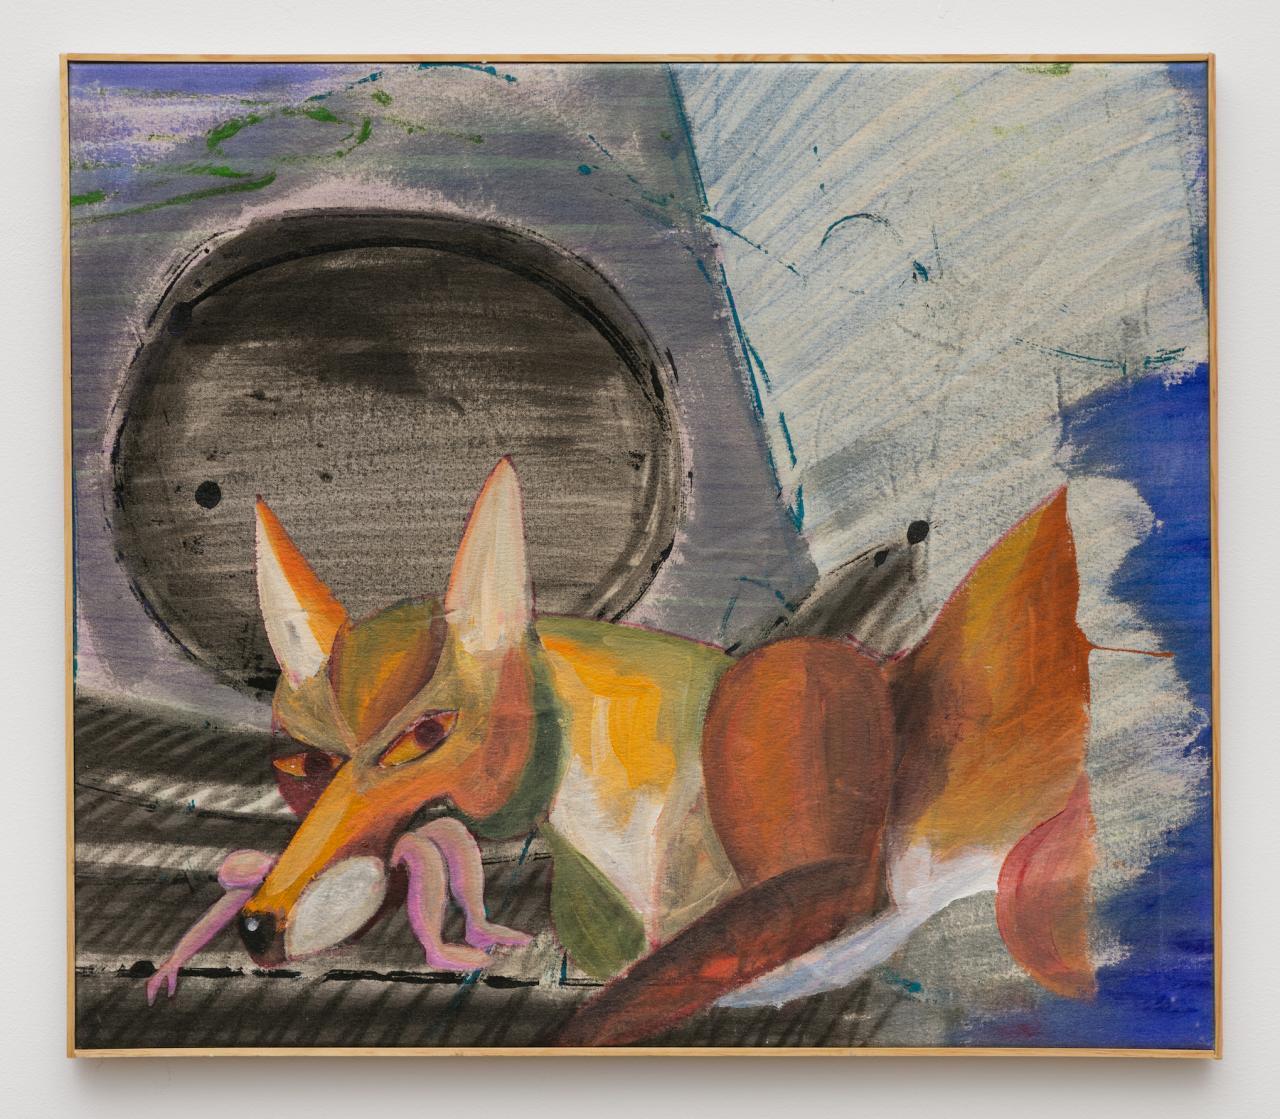 Tom Humphreys Black sun (2018) Foxy Production hostingChristian Andersen,Copenhagen, and Edouard Malingue Gallery,HongKong